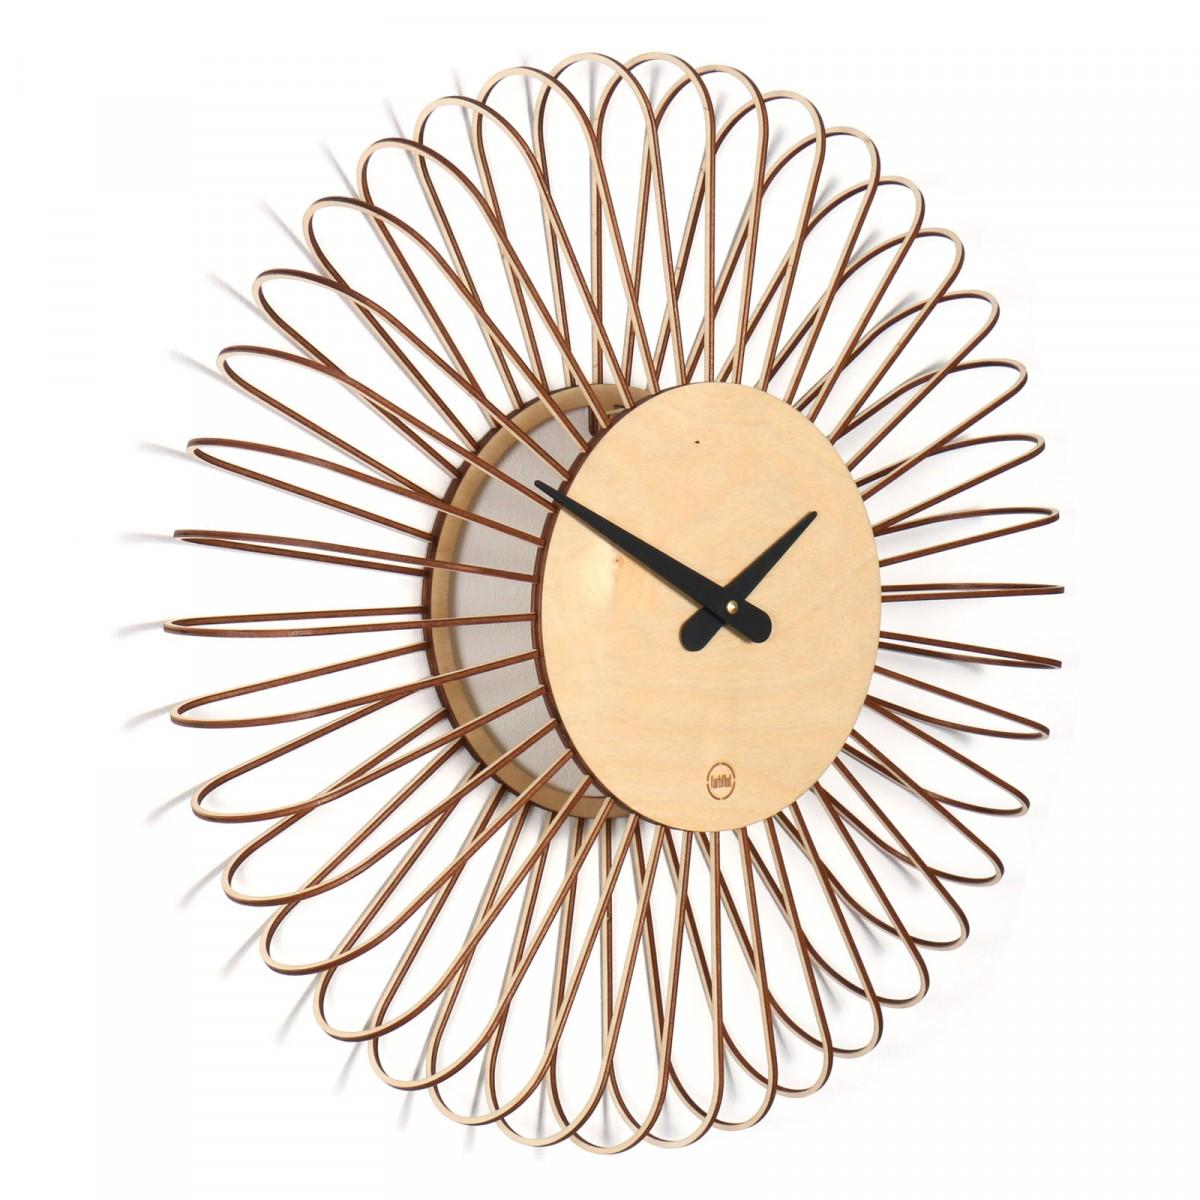 Farbflut design wanduhr circulo - Wanduhr sunflower ...